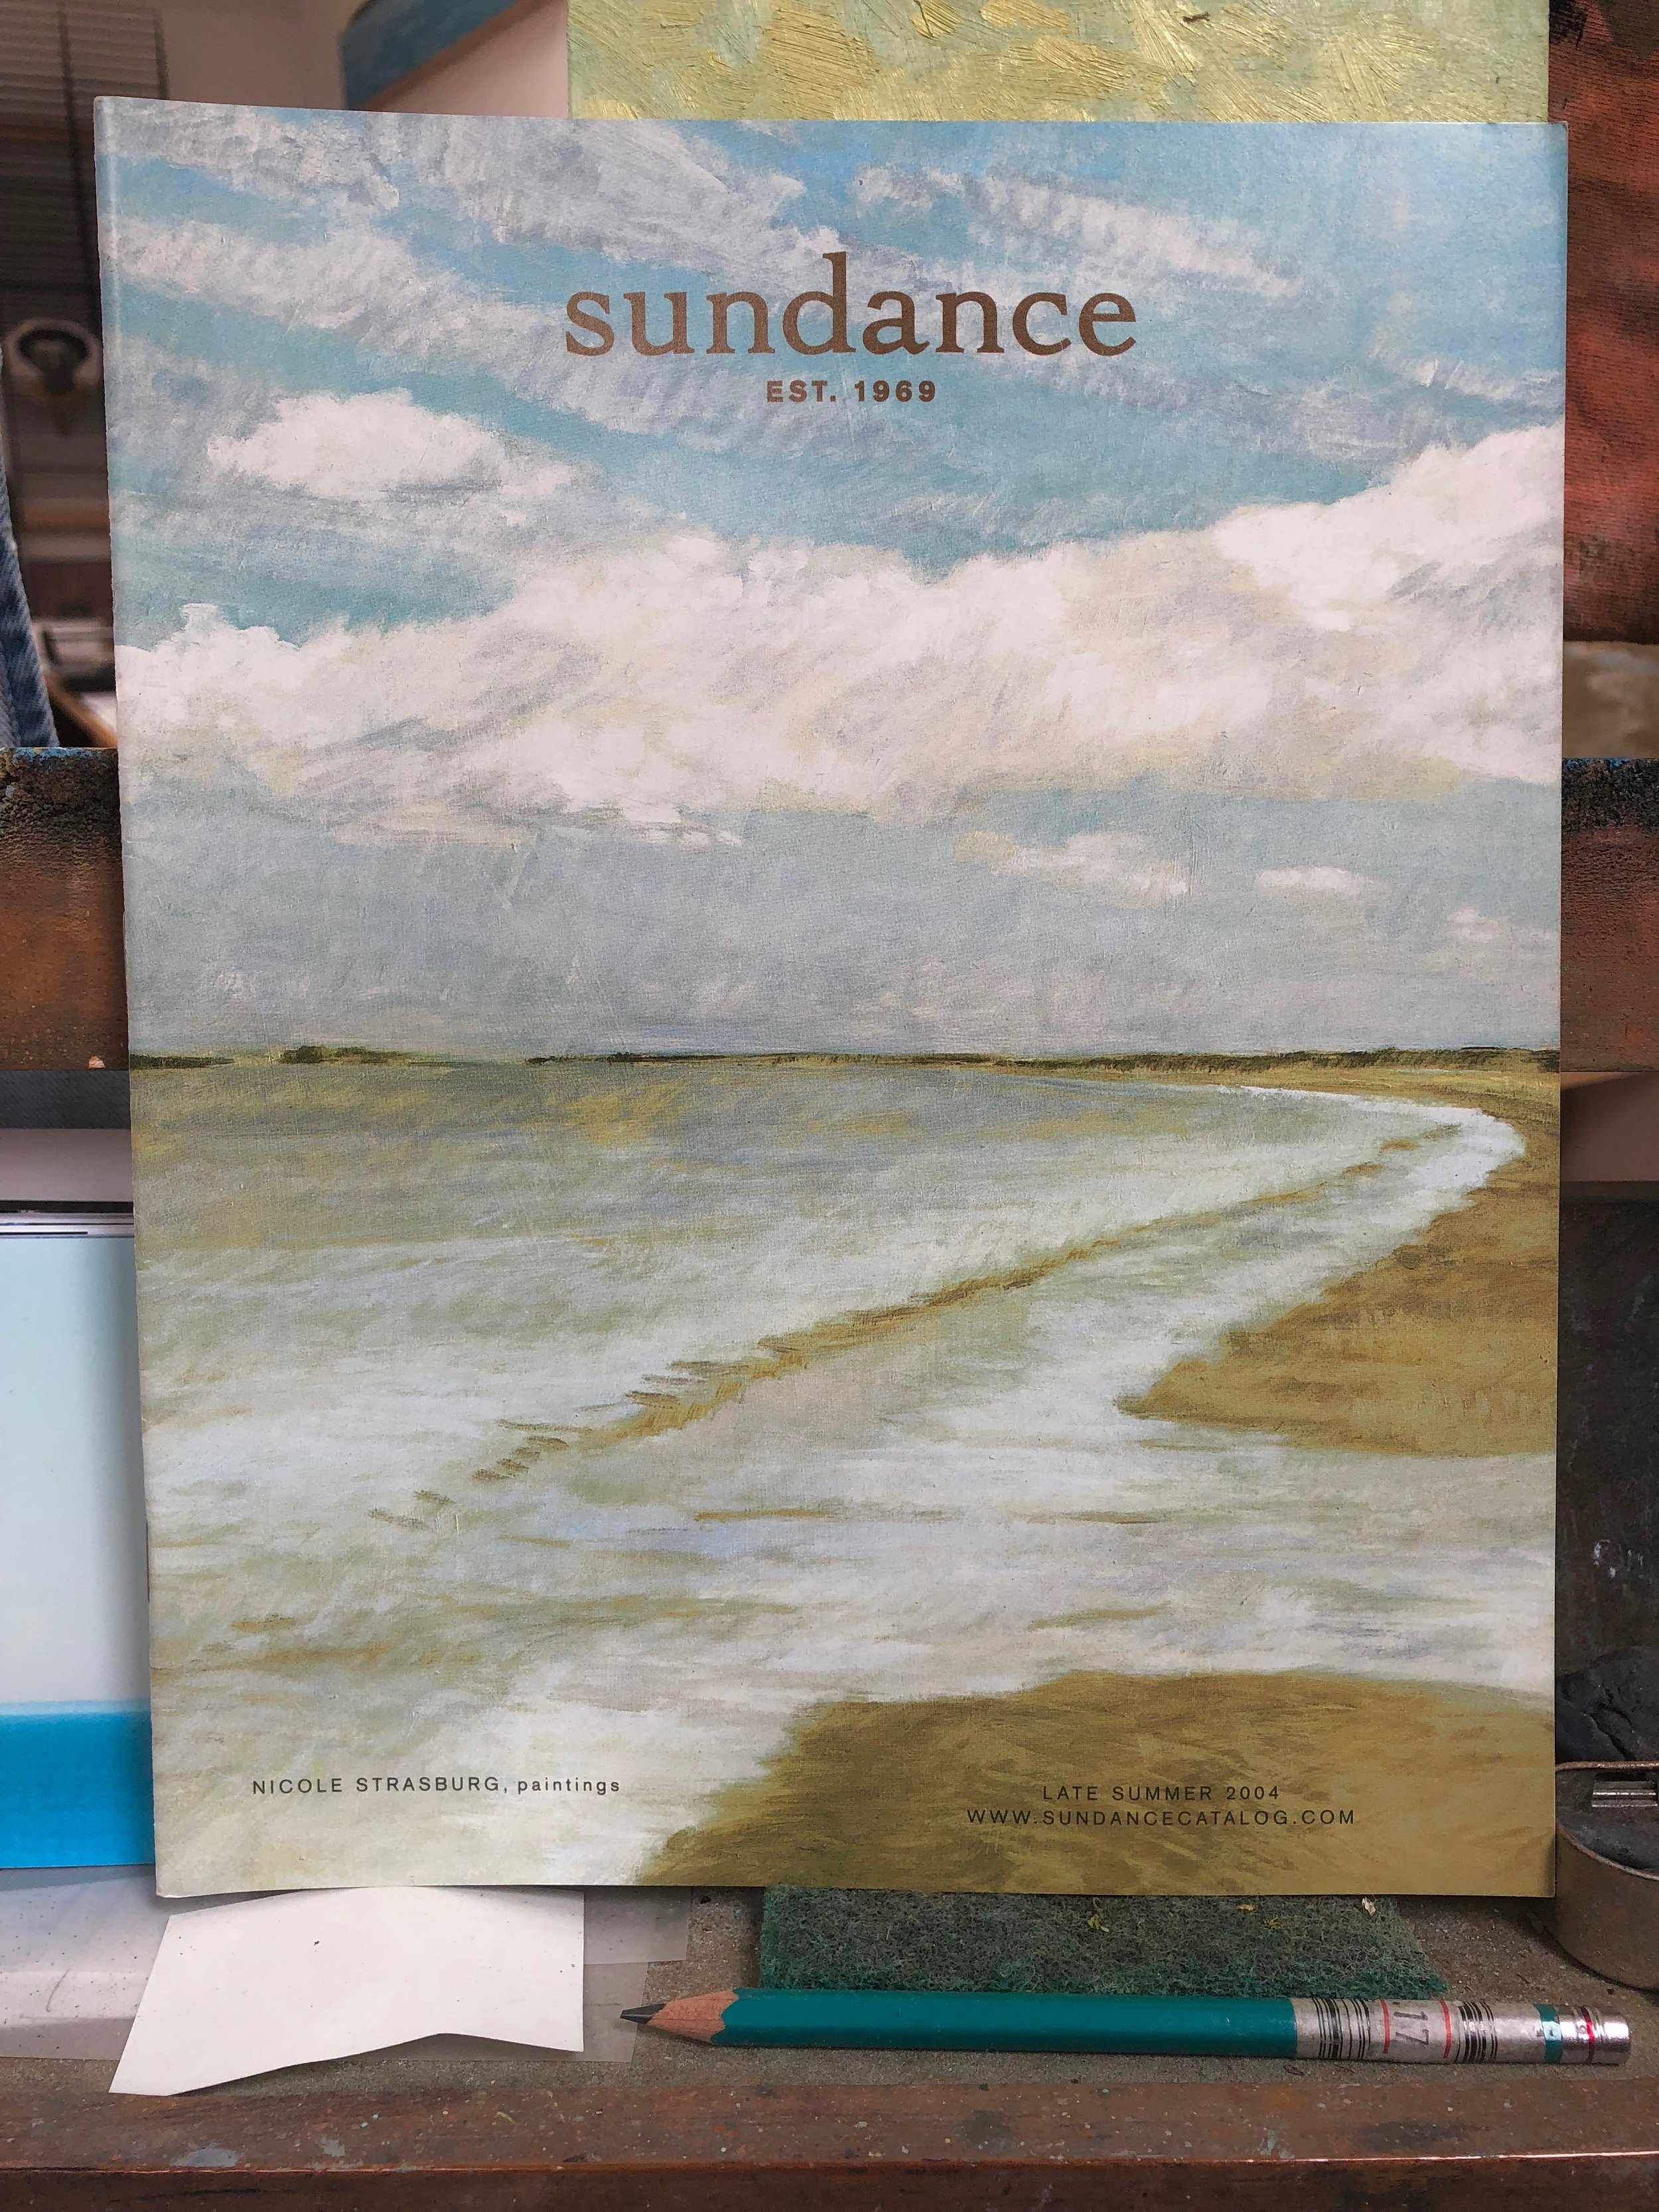 Normandy Shore - Cover for Sundance Summer 2004